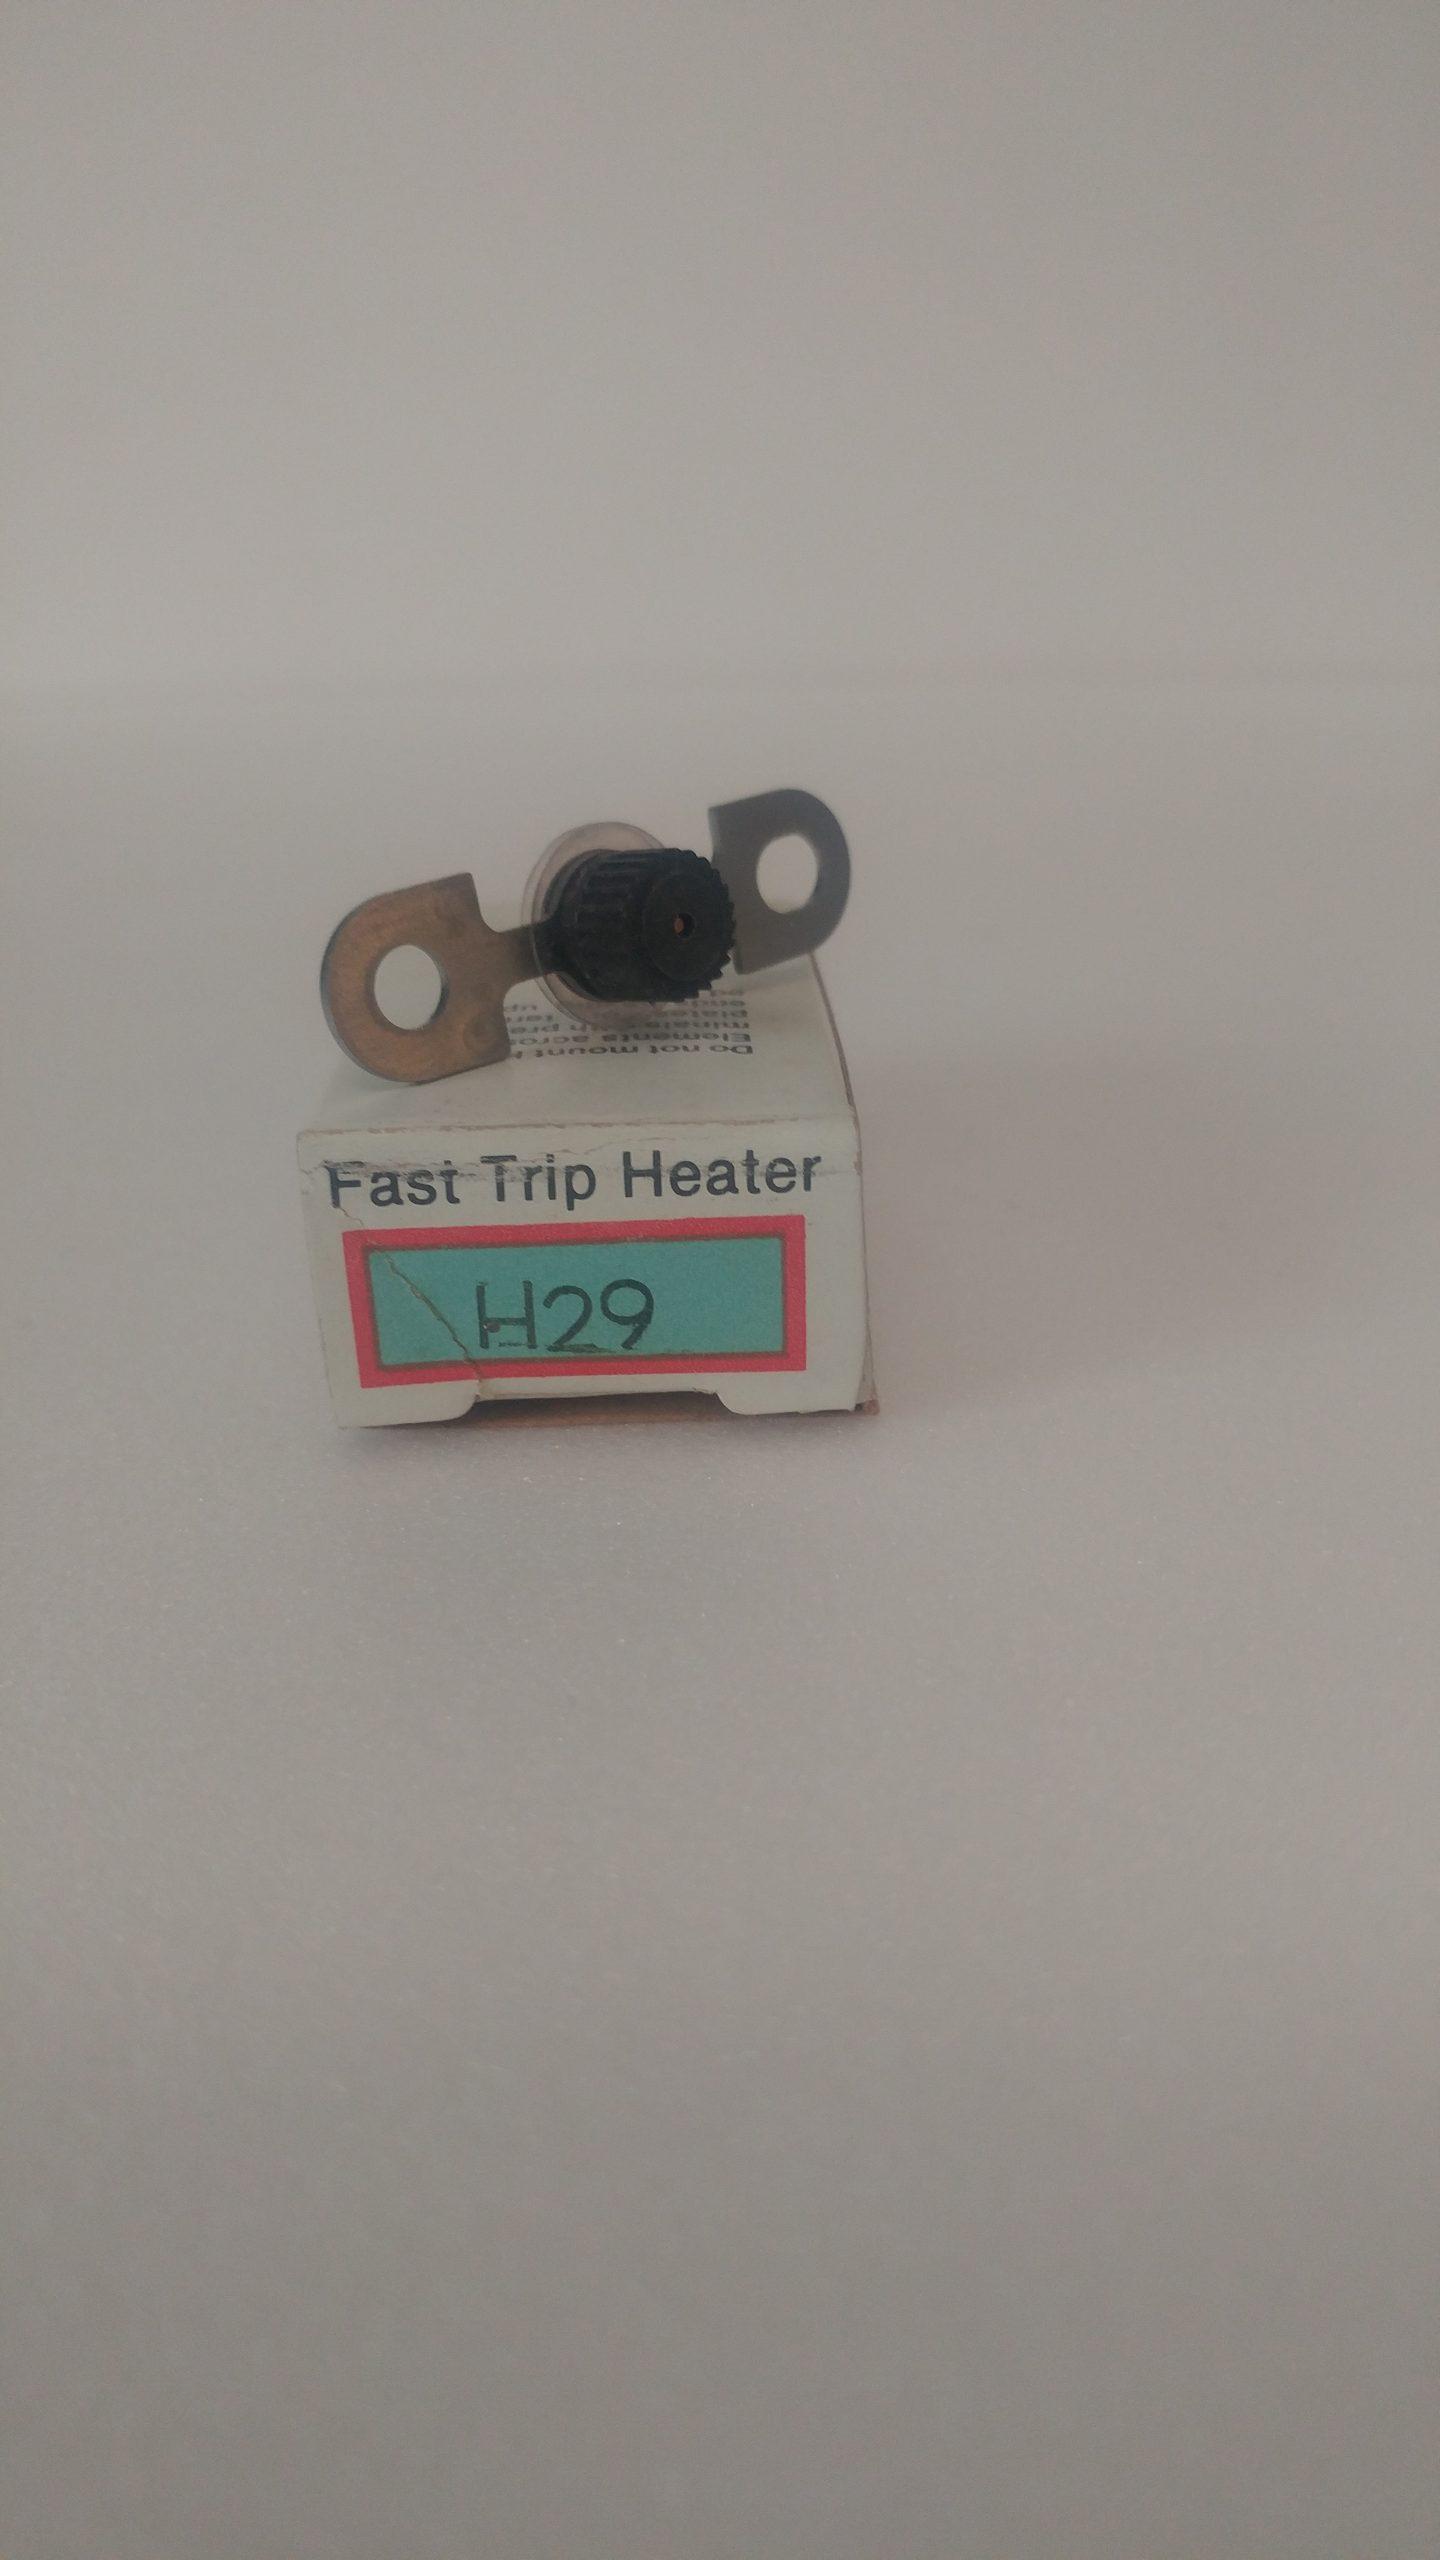 Cutler Hammer Eaton H29 Overload Heater